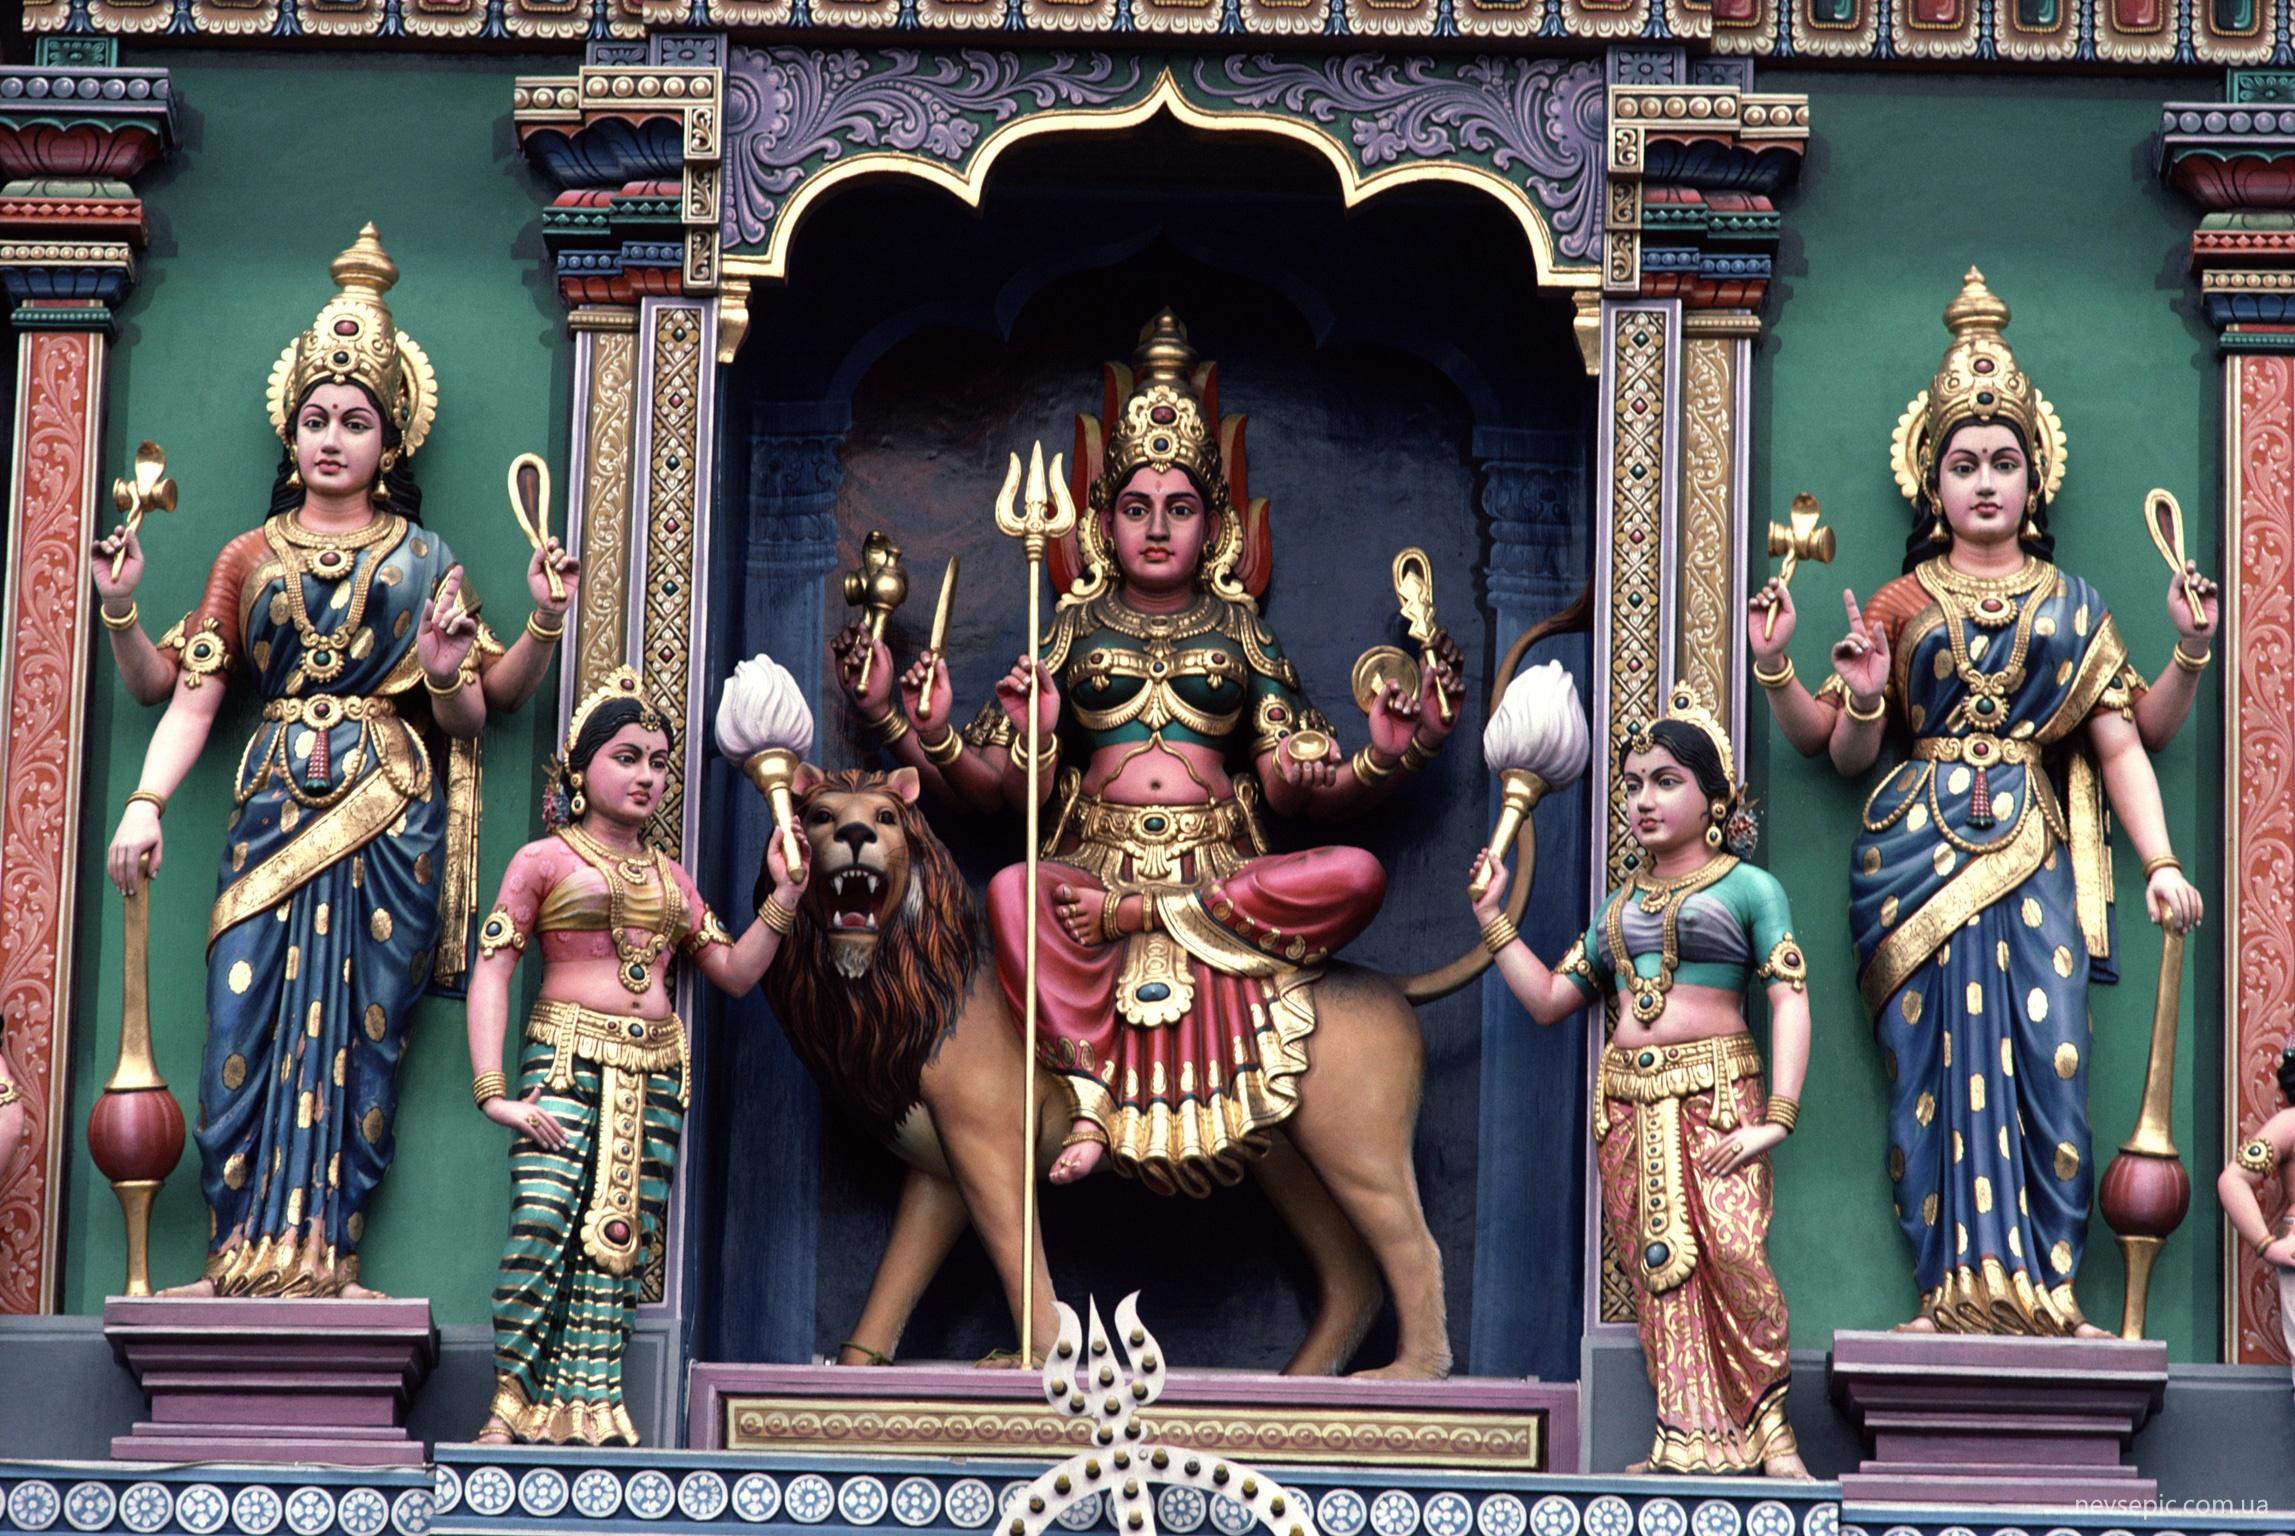 Религия на санскрите означает - дхарма